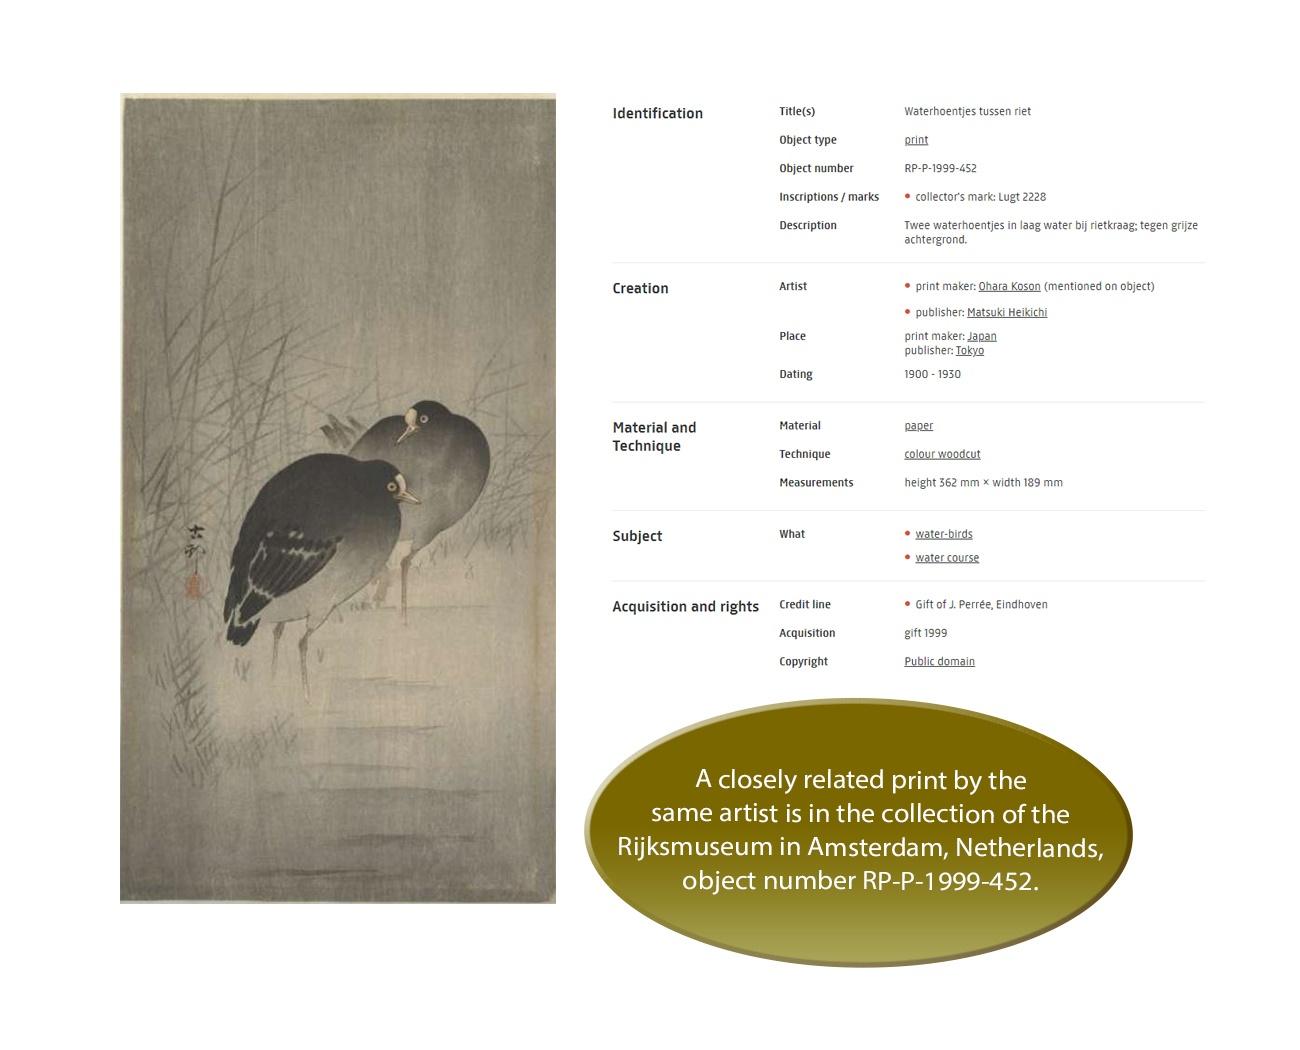 OHARA KOSON: A COLOR WOODBLOCK PRINT OF TWO MOORHENS - Image 5 of 6